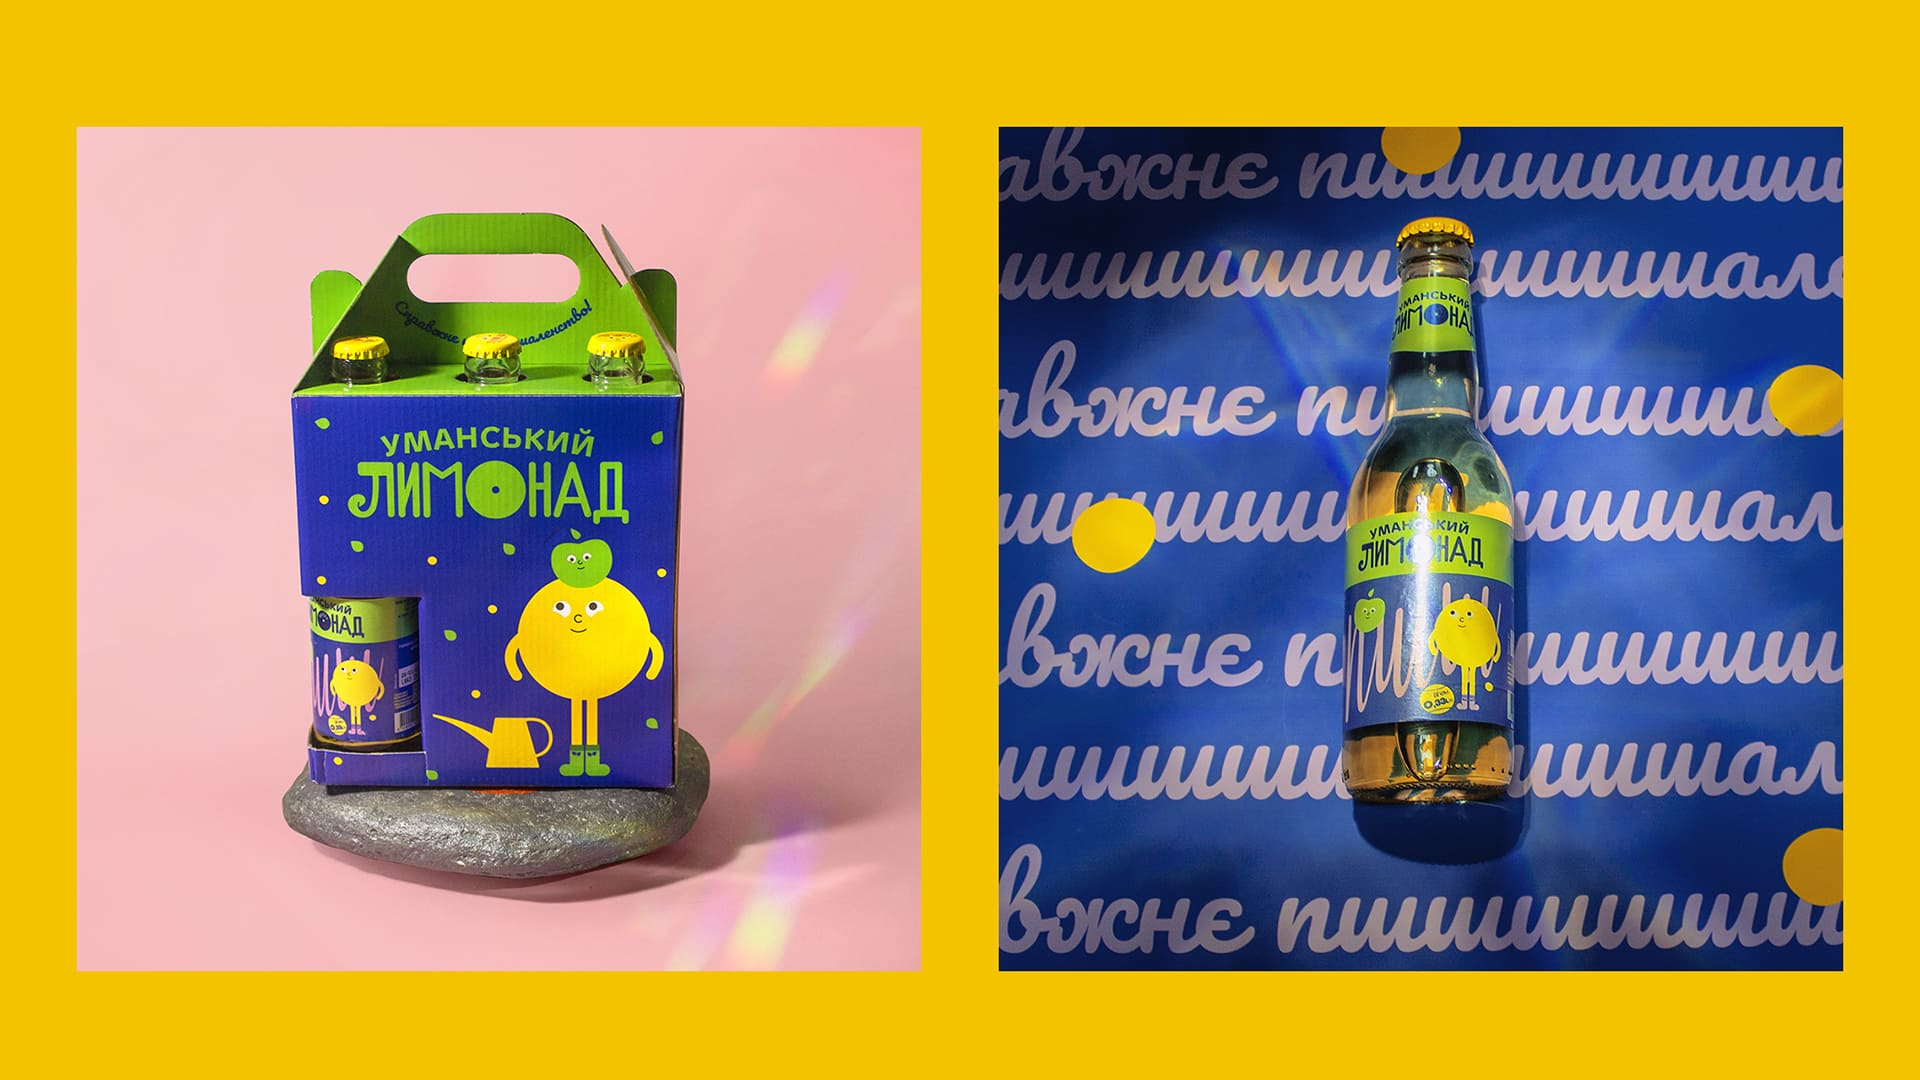 gra brand design umanpivo lemonade 17